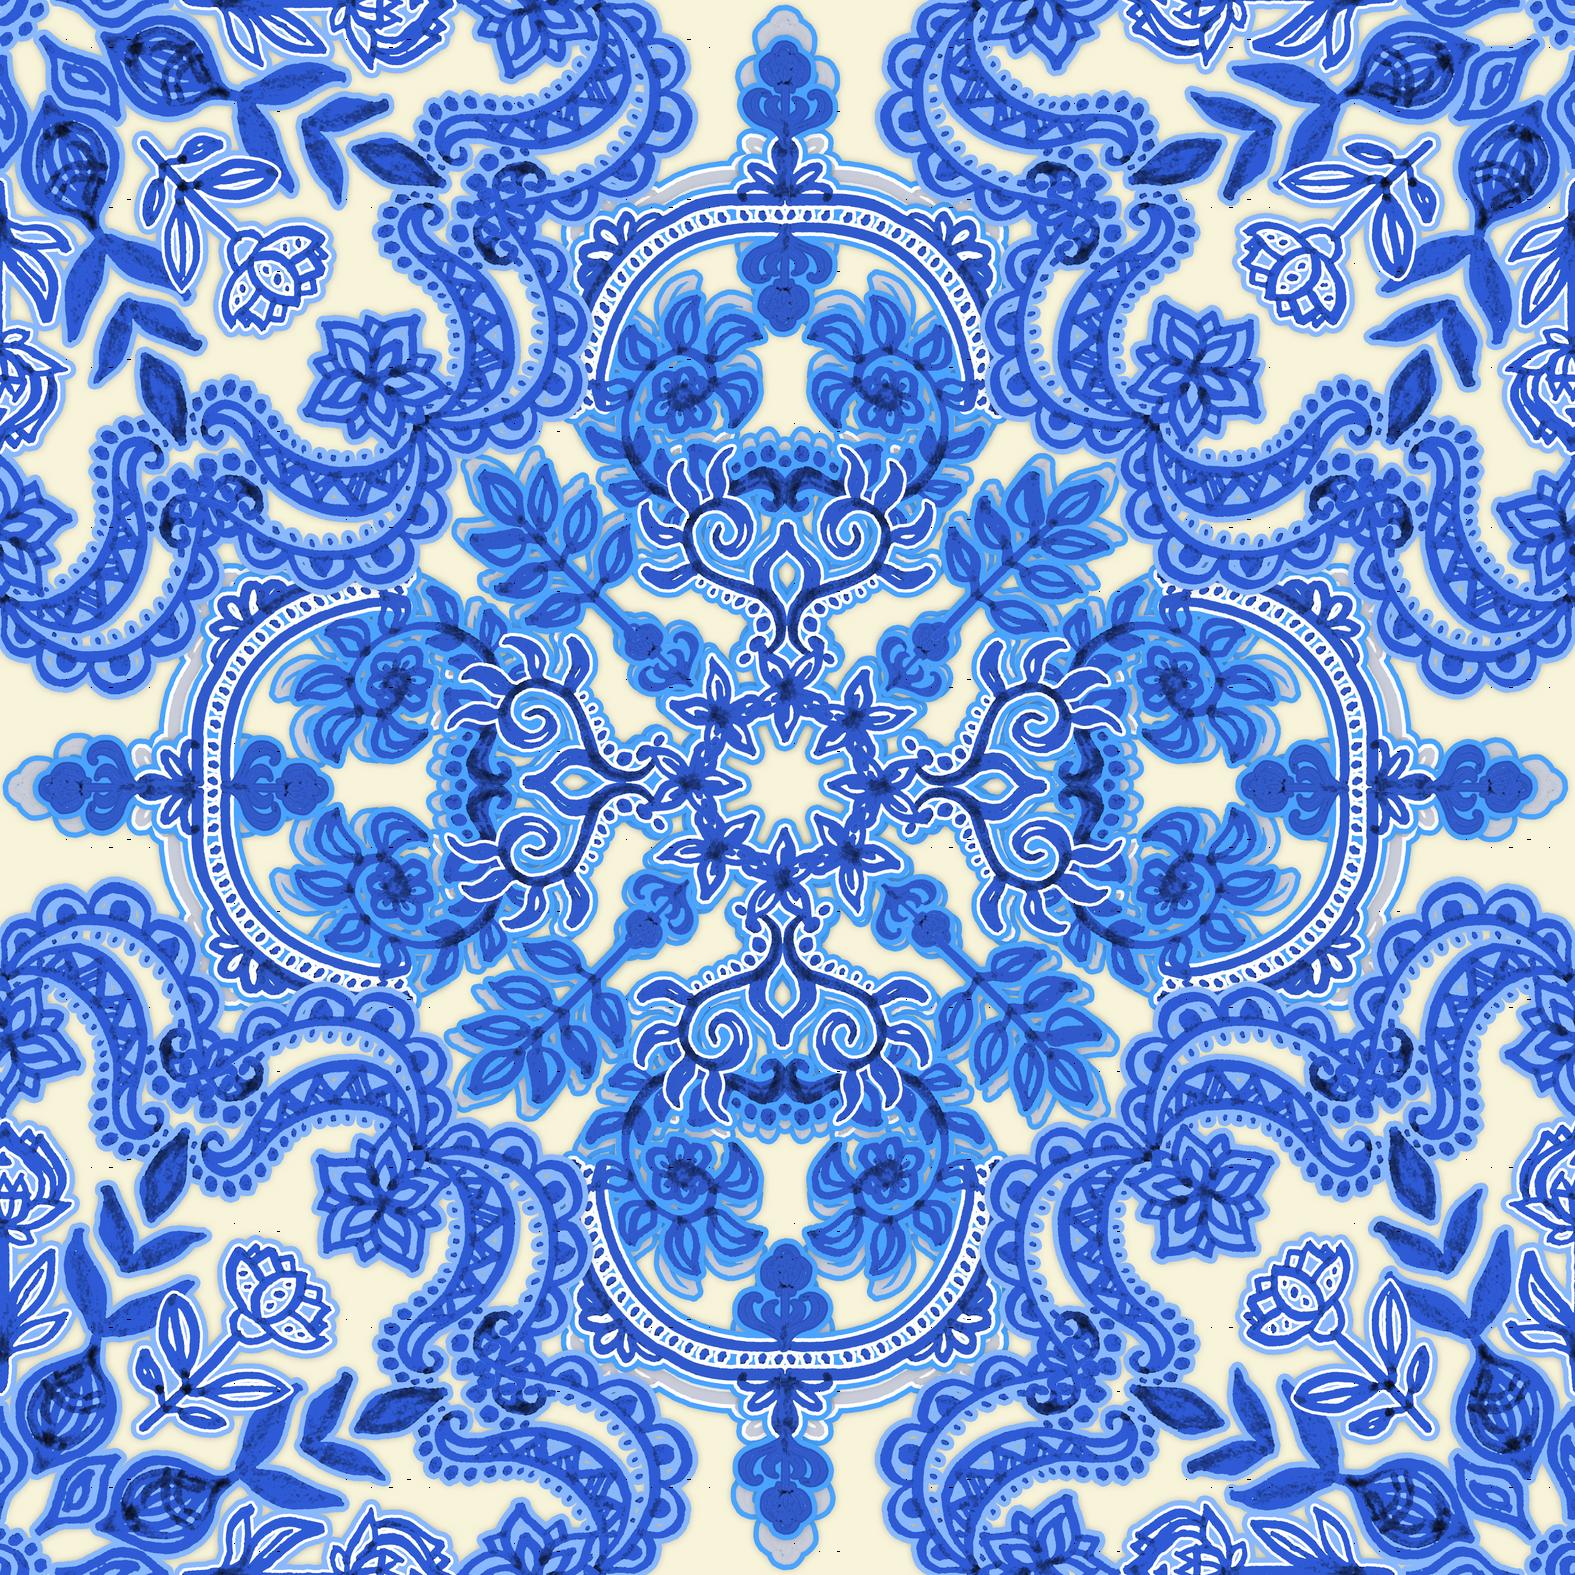 Cobalt Blue China White Folk Art Pattern Wallpaper